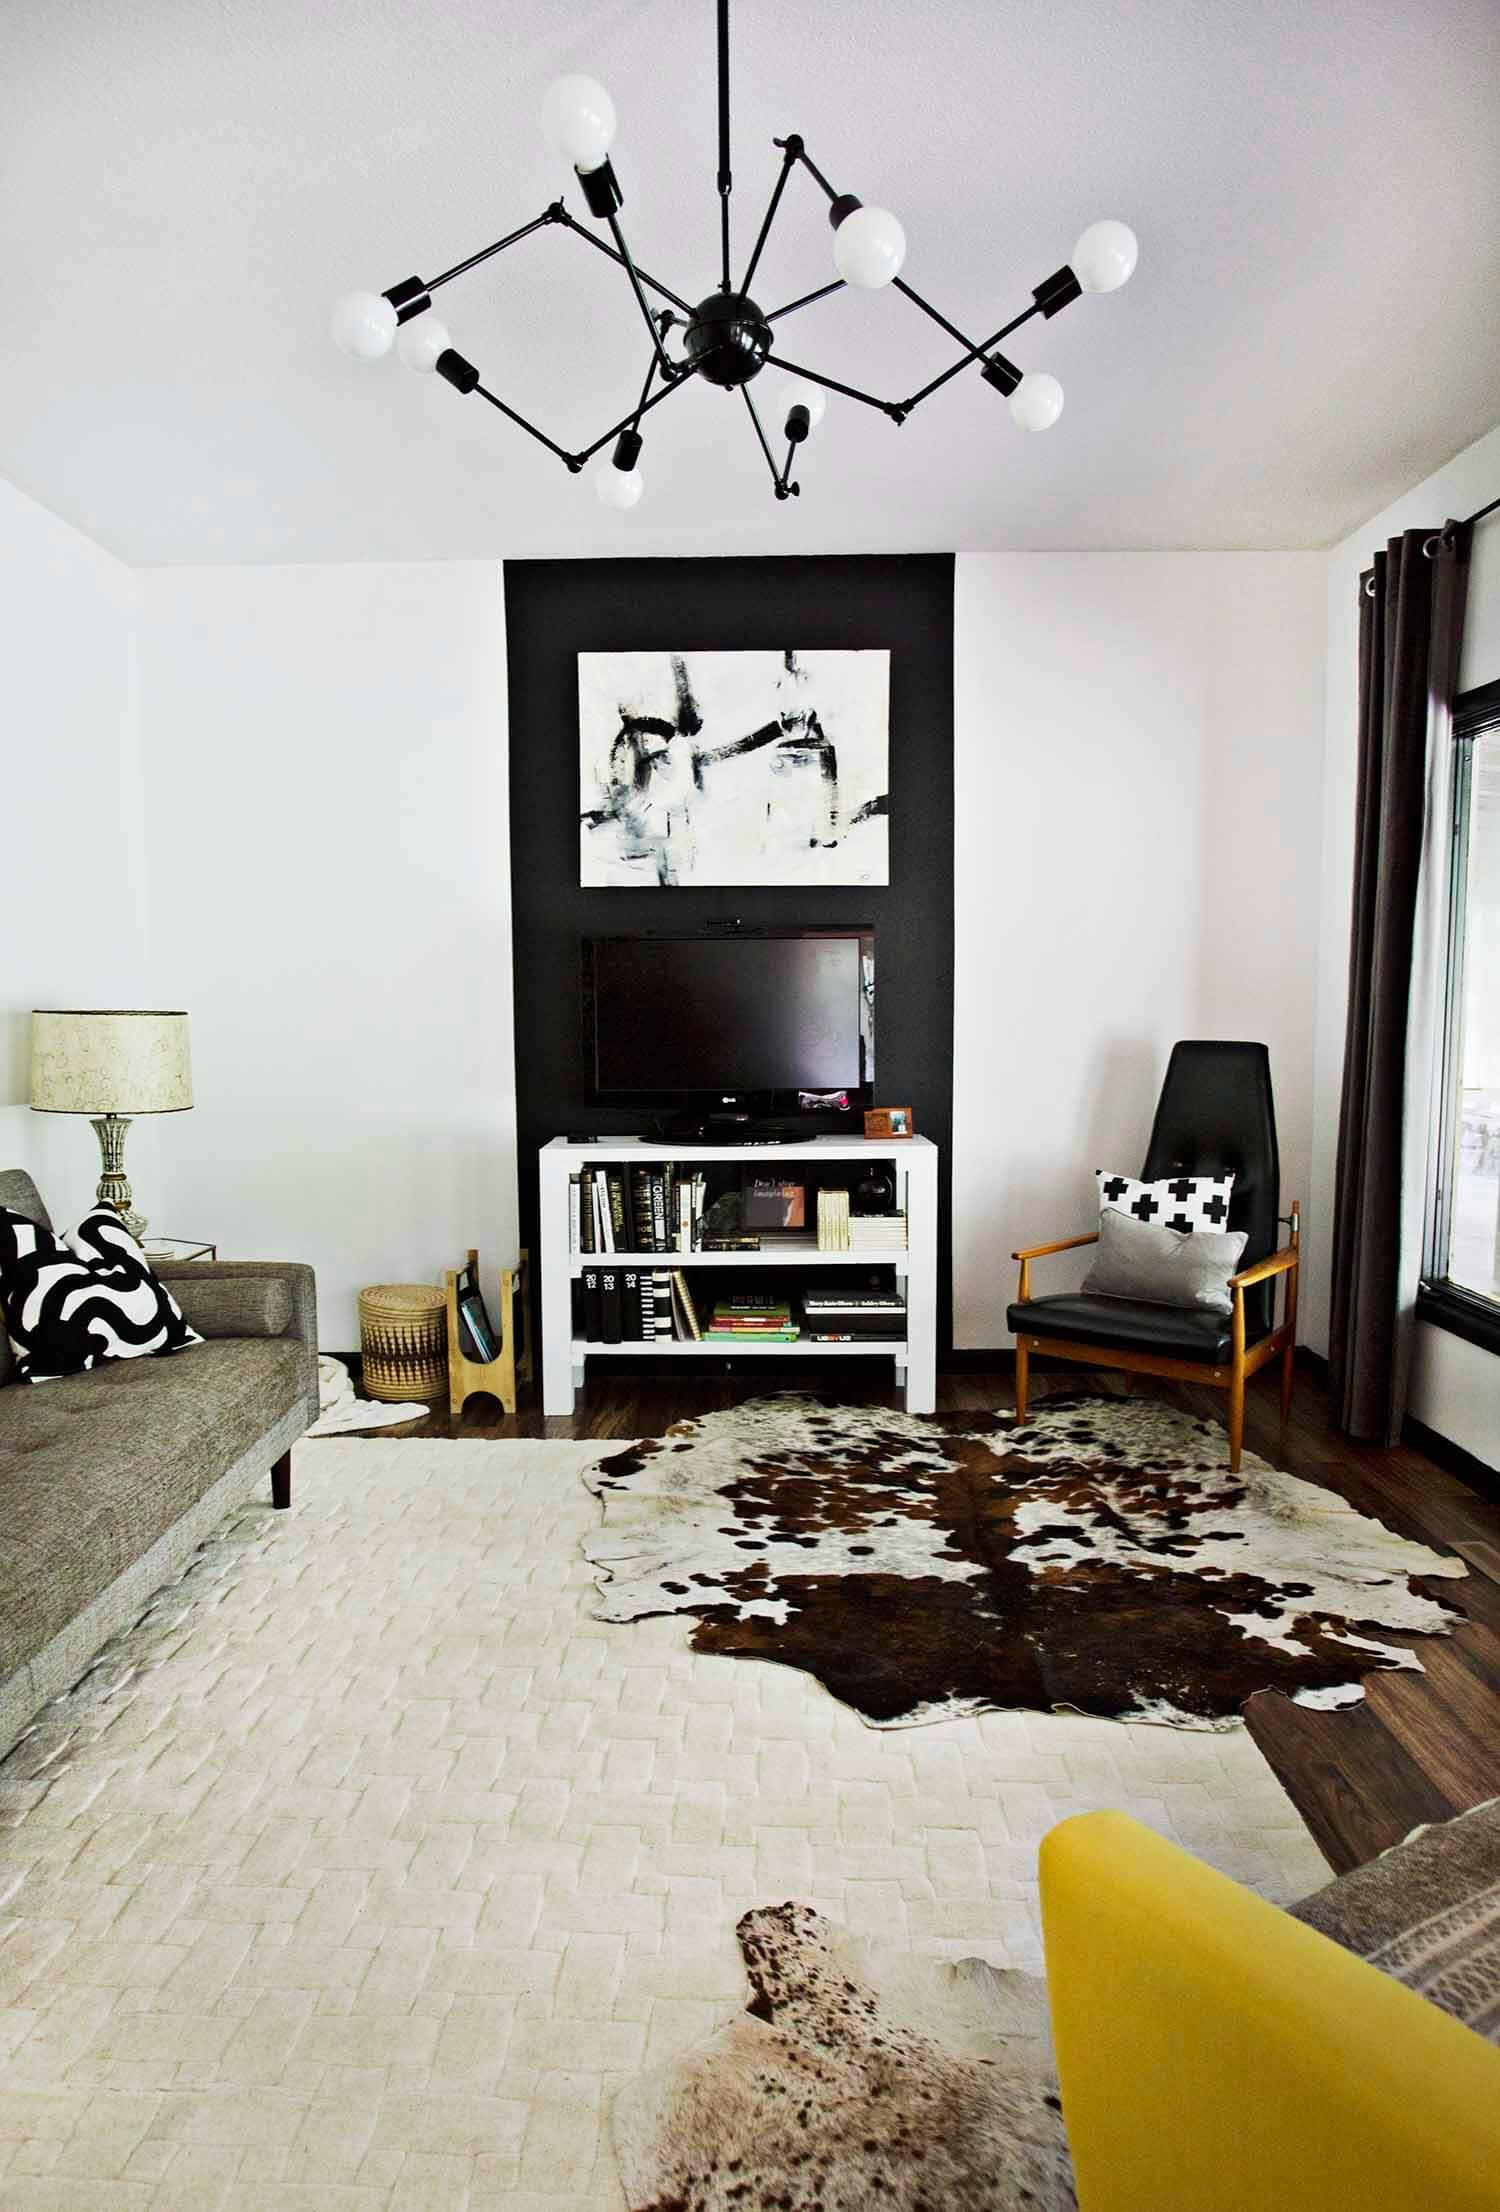 Accent walls that hide TVs